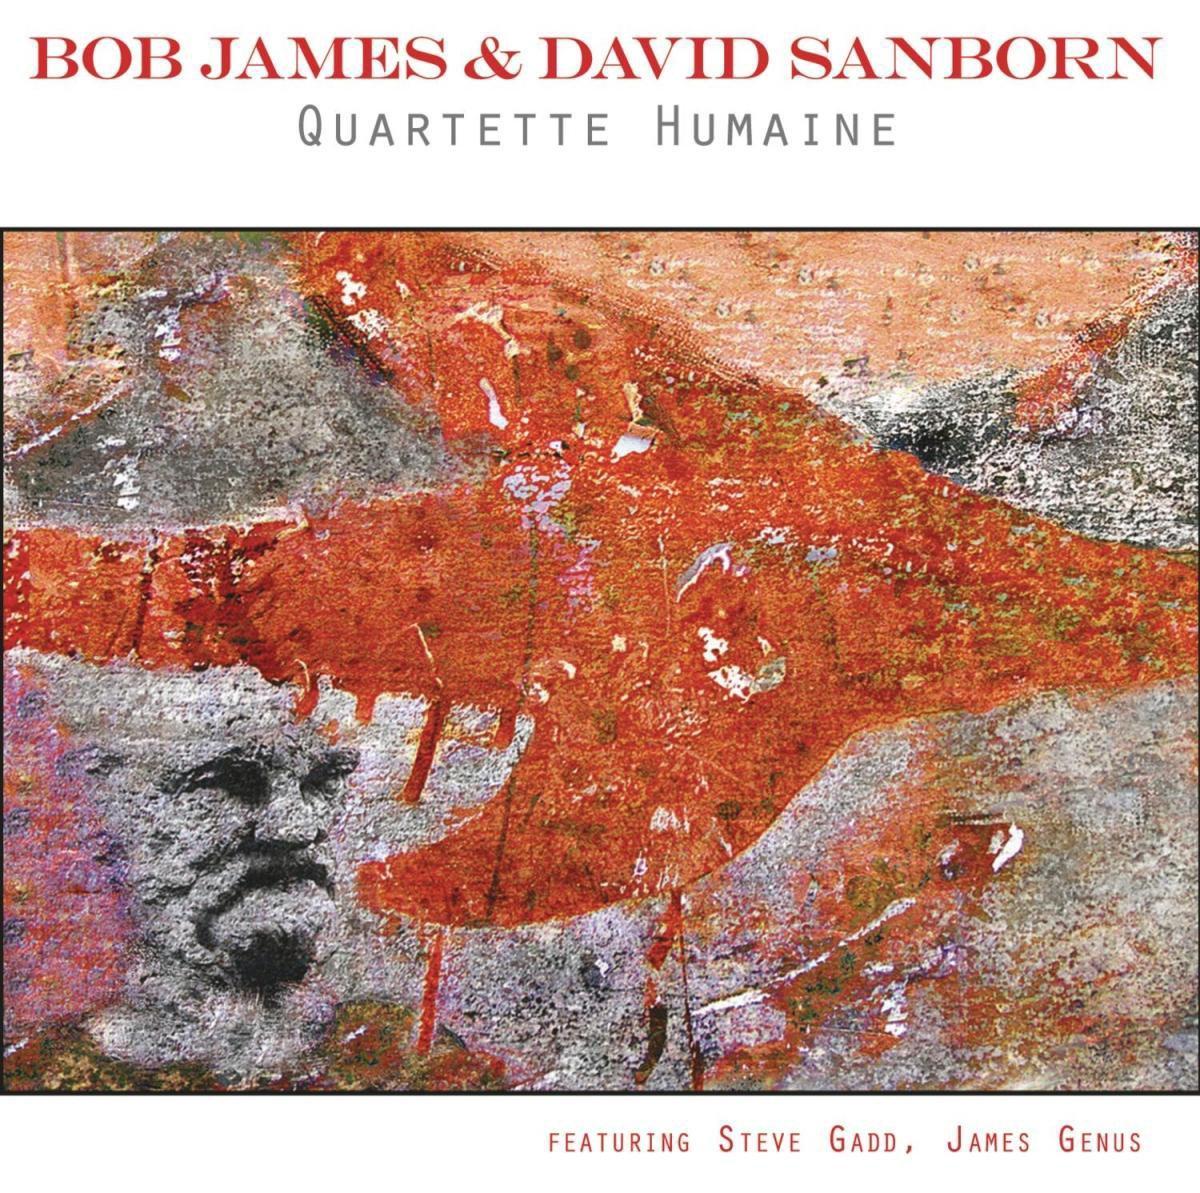 Quartette Humaine - Bob James & David Sanborn